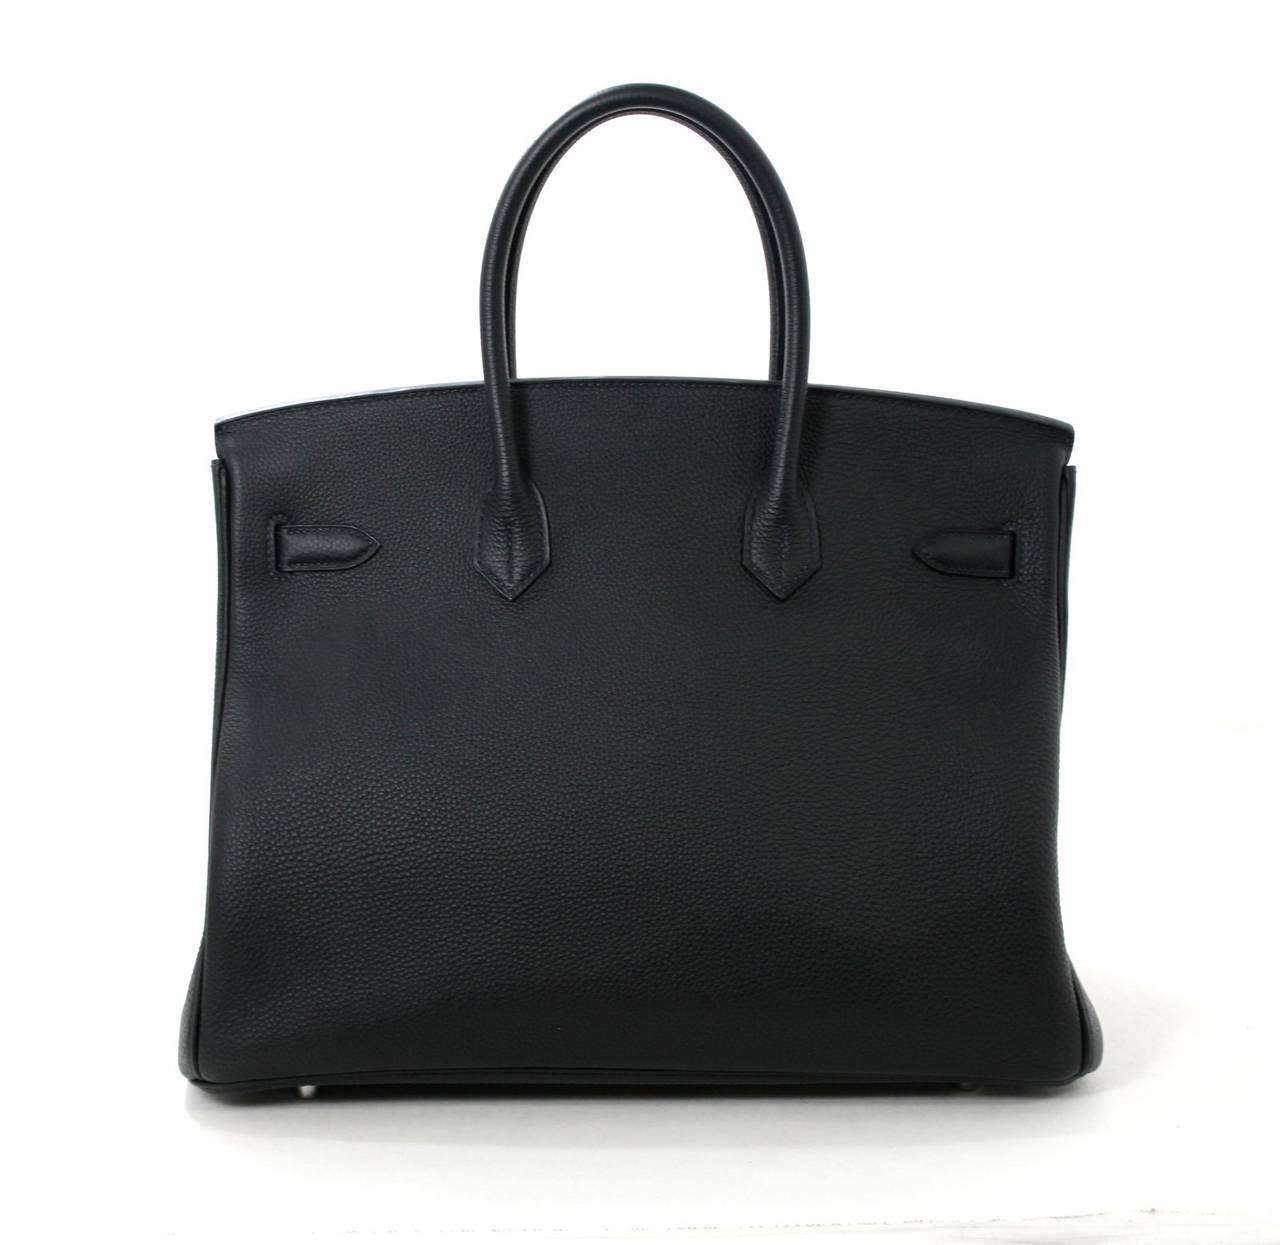 ... Fashion  Handbags and Purses  Top Handle Bags  Hermes Birkin Bags